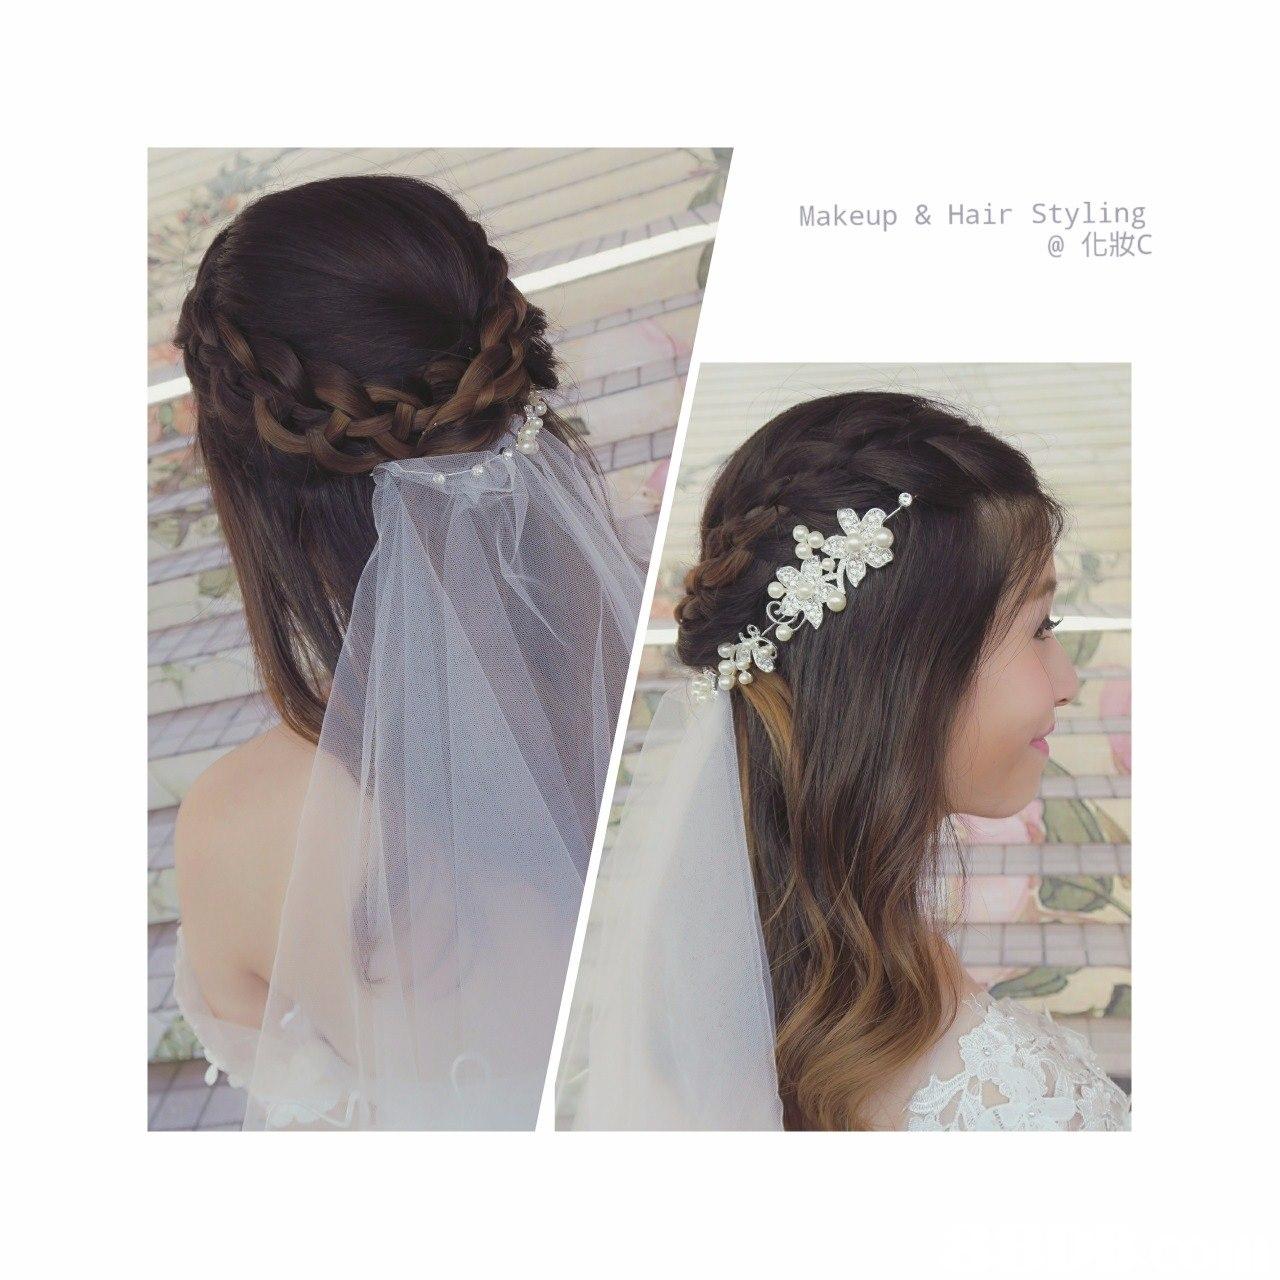 Makeup &Hair Styling @化妝c,hair,headpiece,hair accessory,bridal veil,bridal accessory